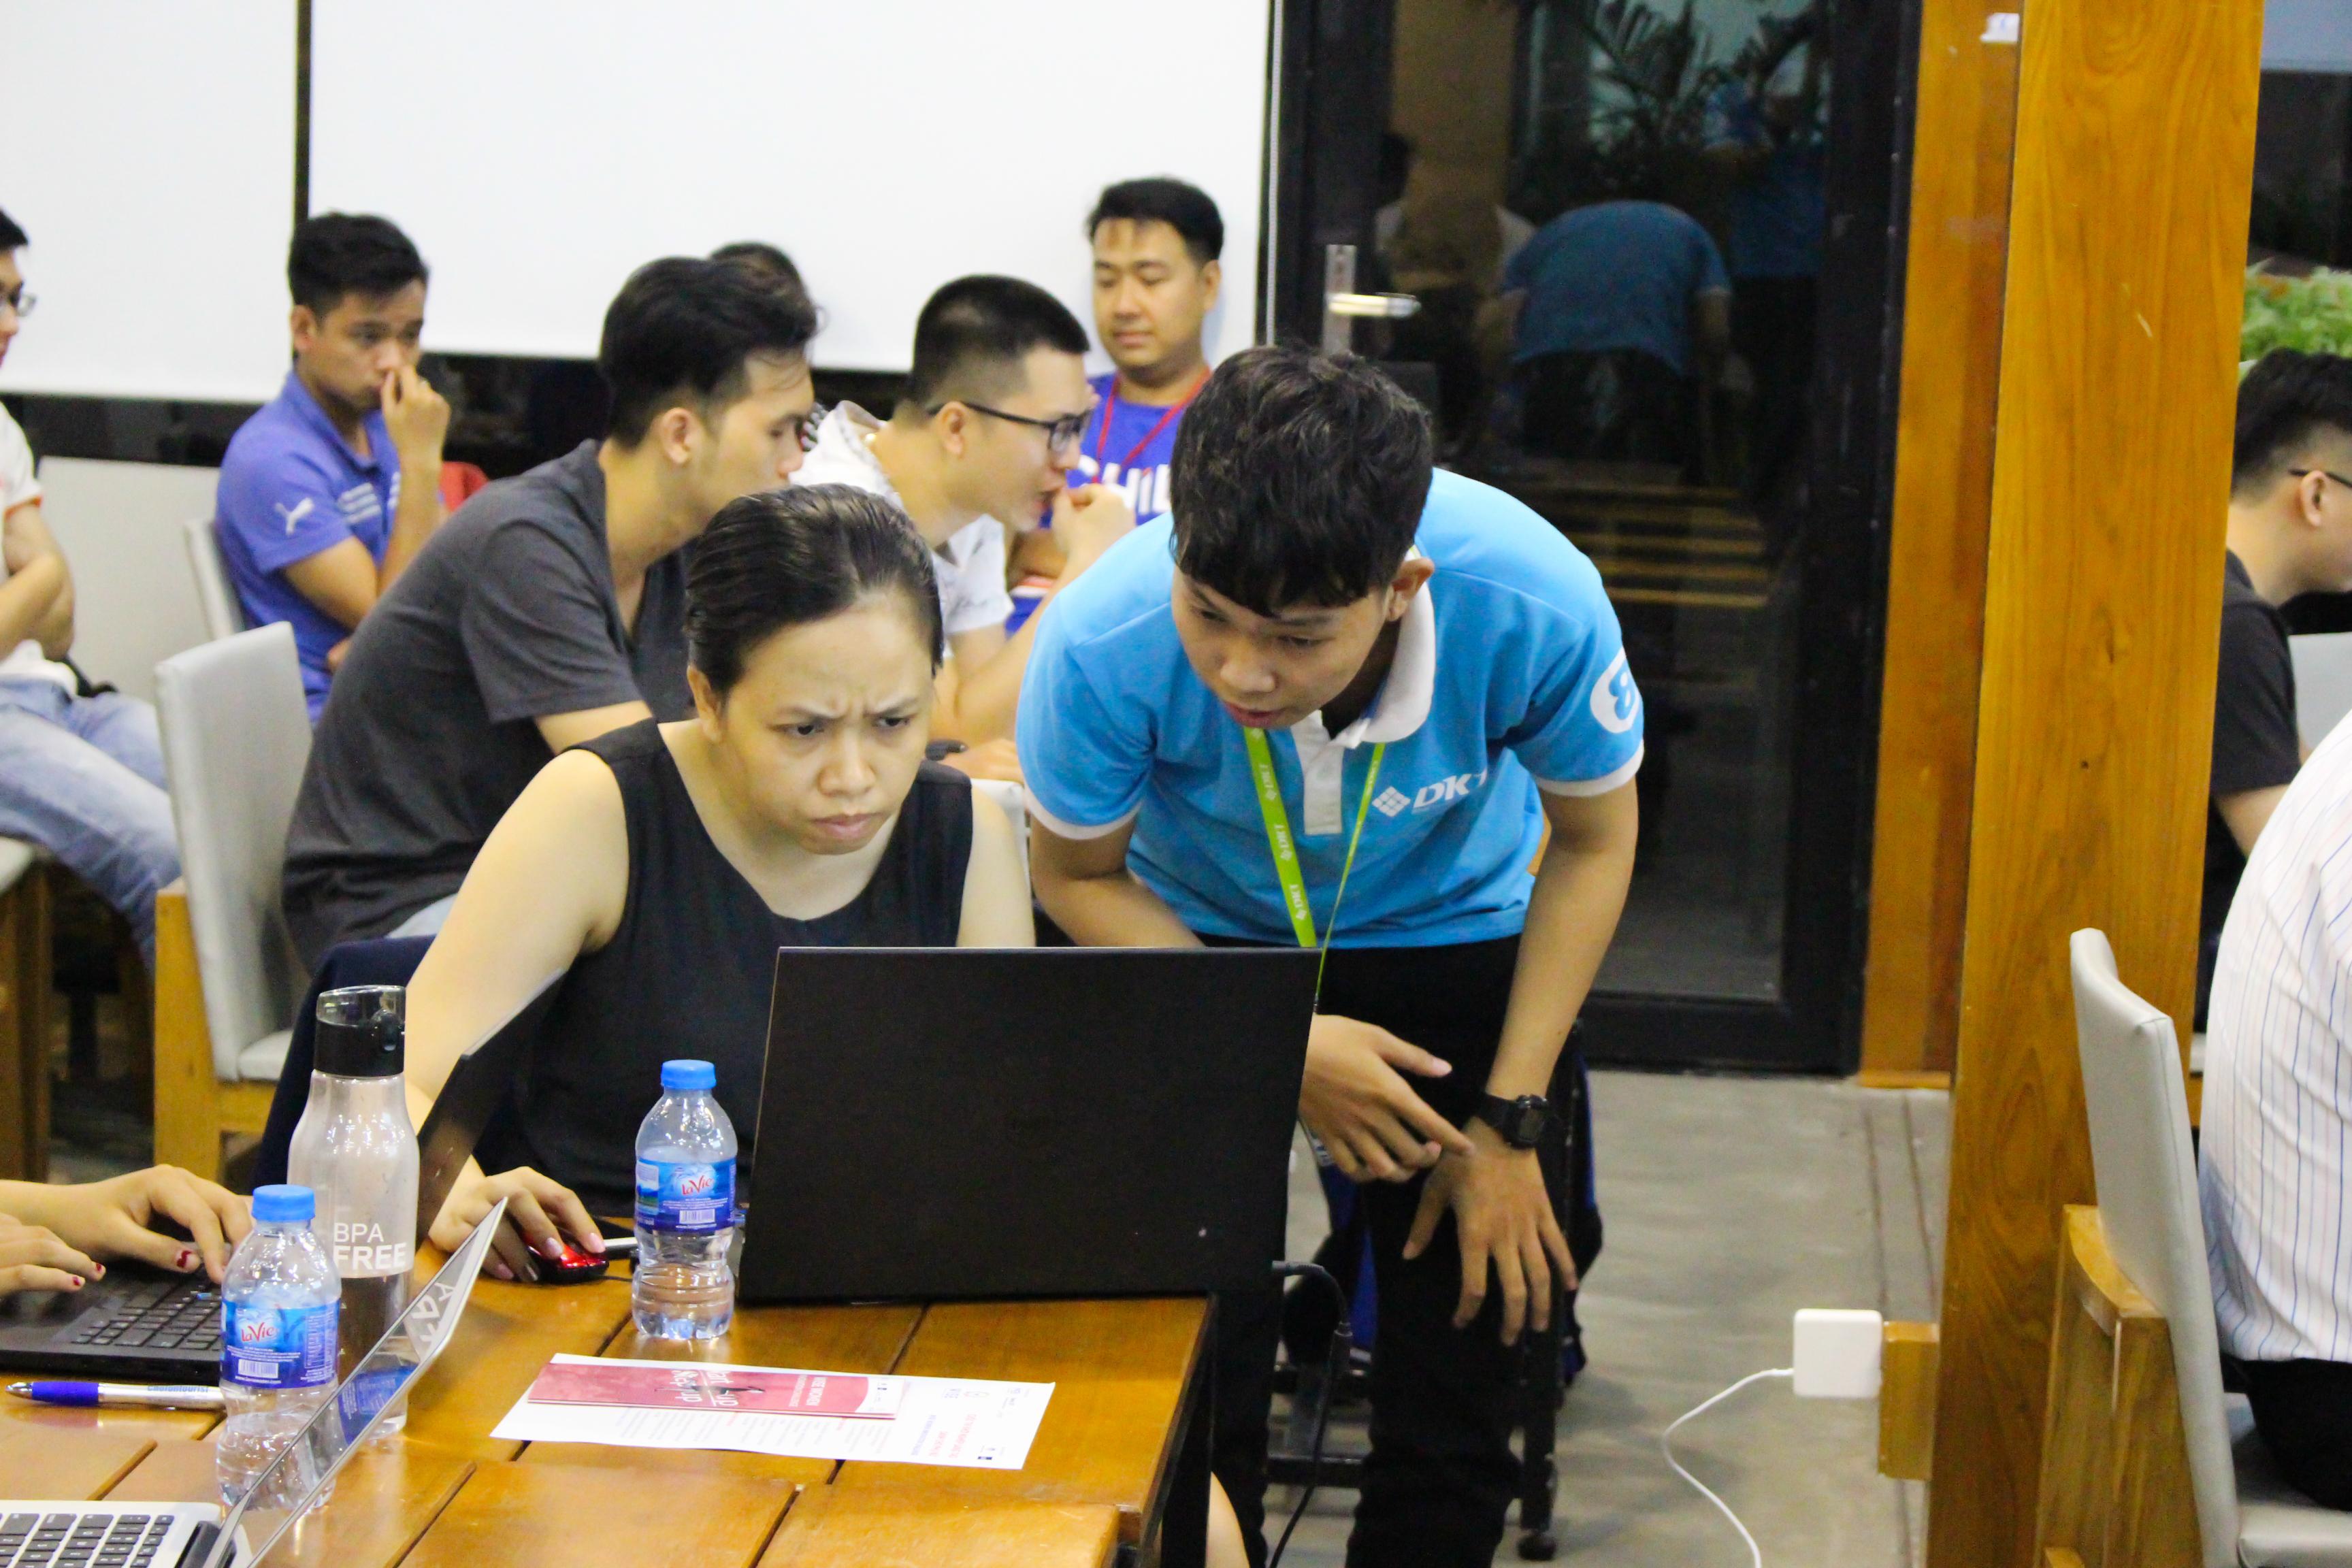 Gần 30 chủ shop tham gia workshop Xây dựng Web Và Landing Page để tạo Omnichannel